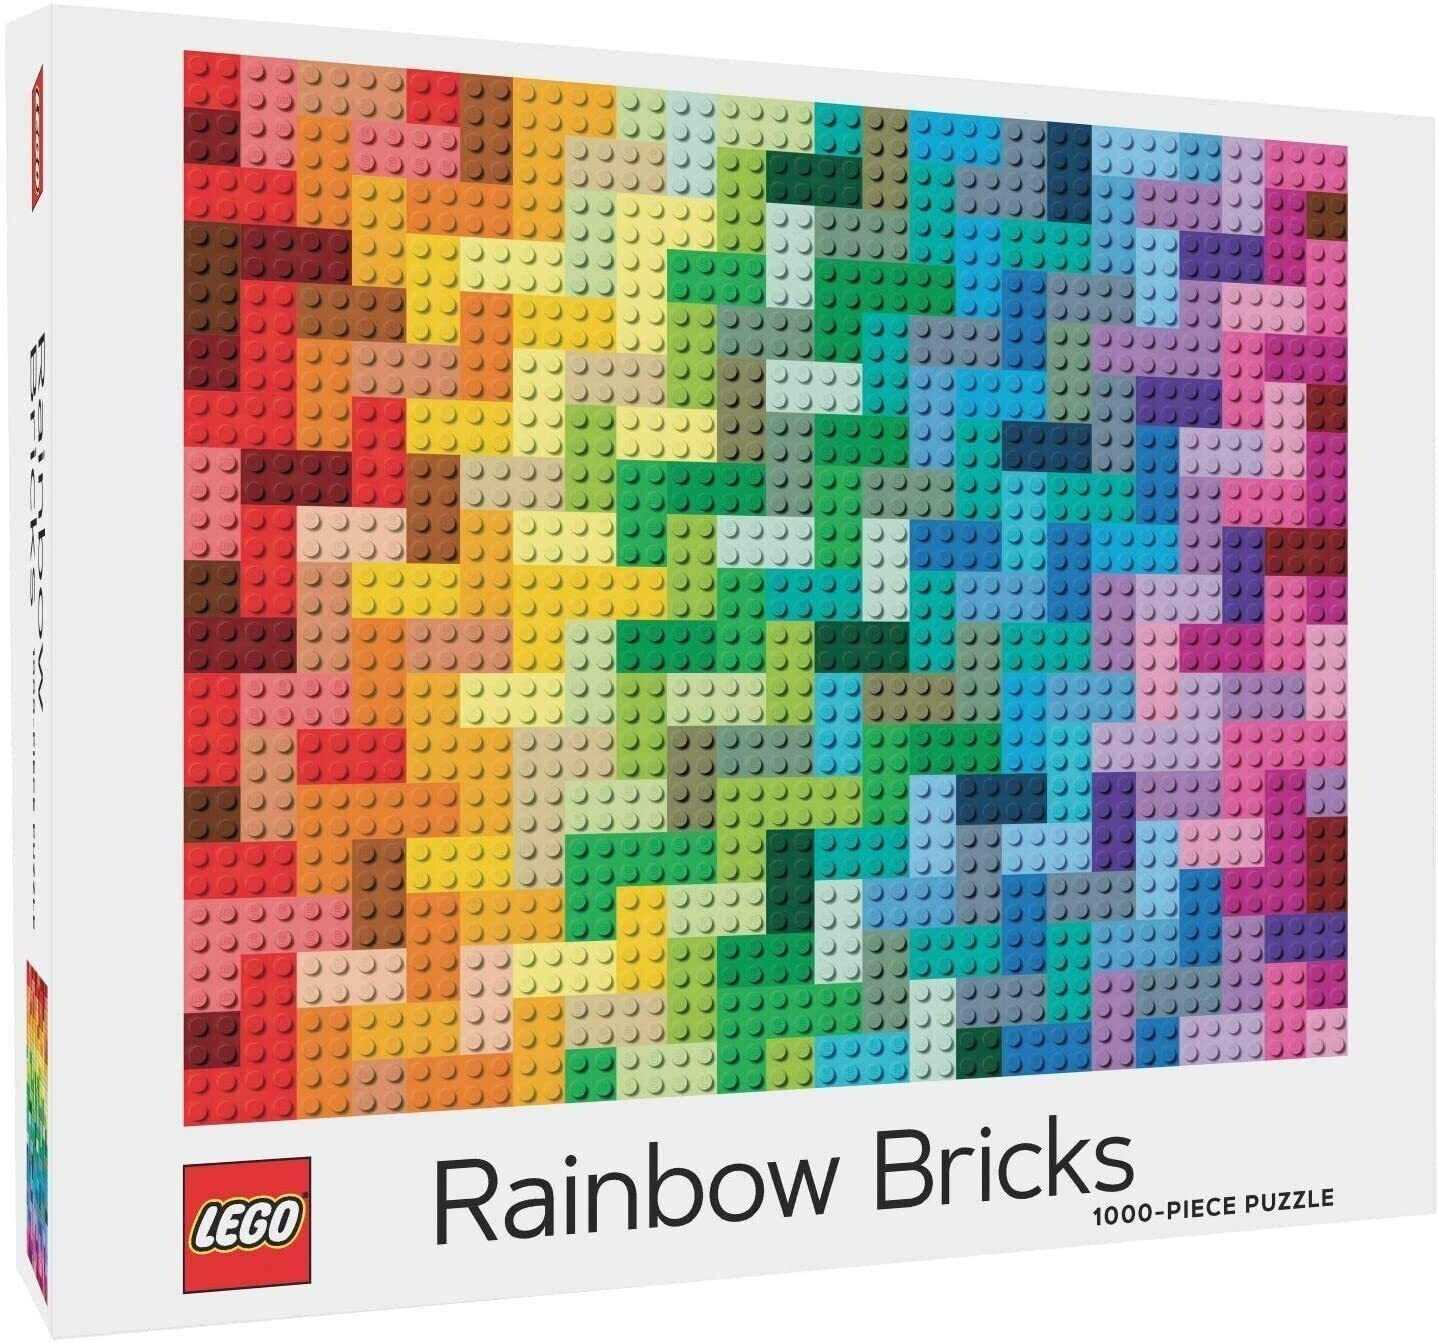 Lego Rainbow Bricks 1000 Pc